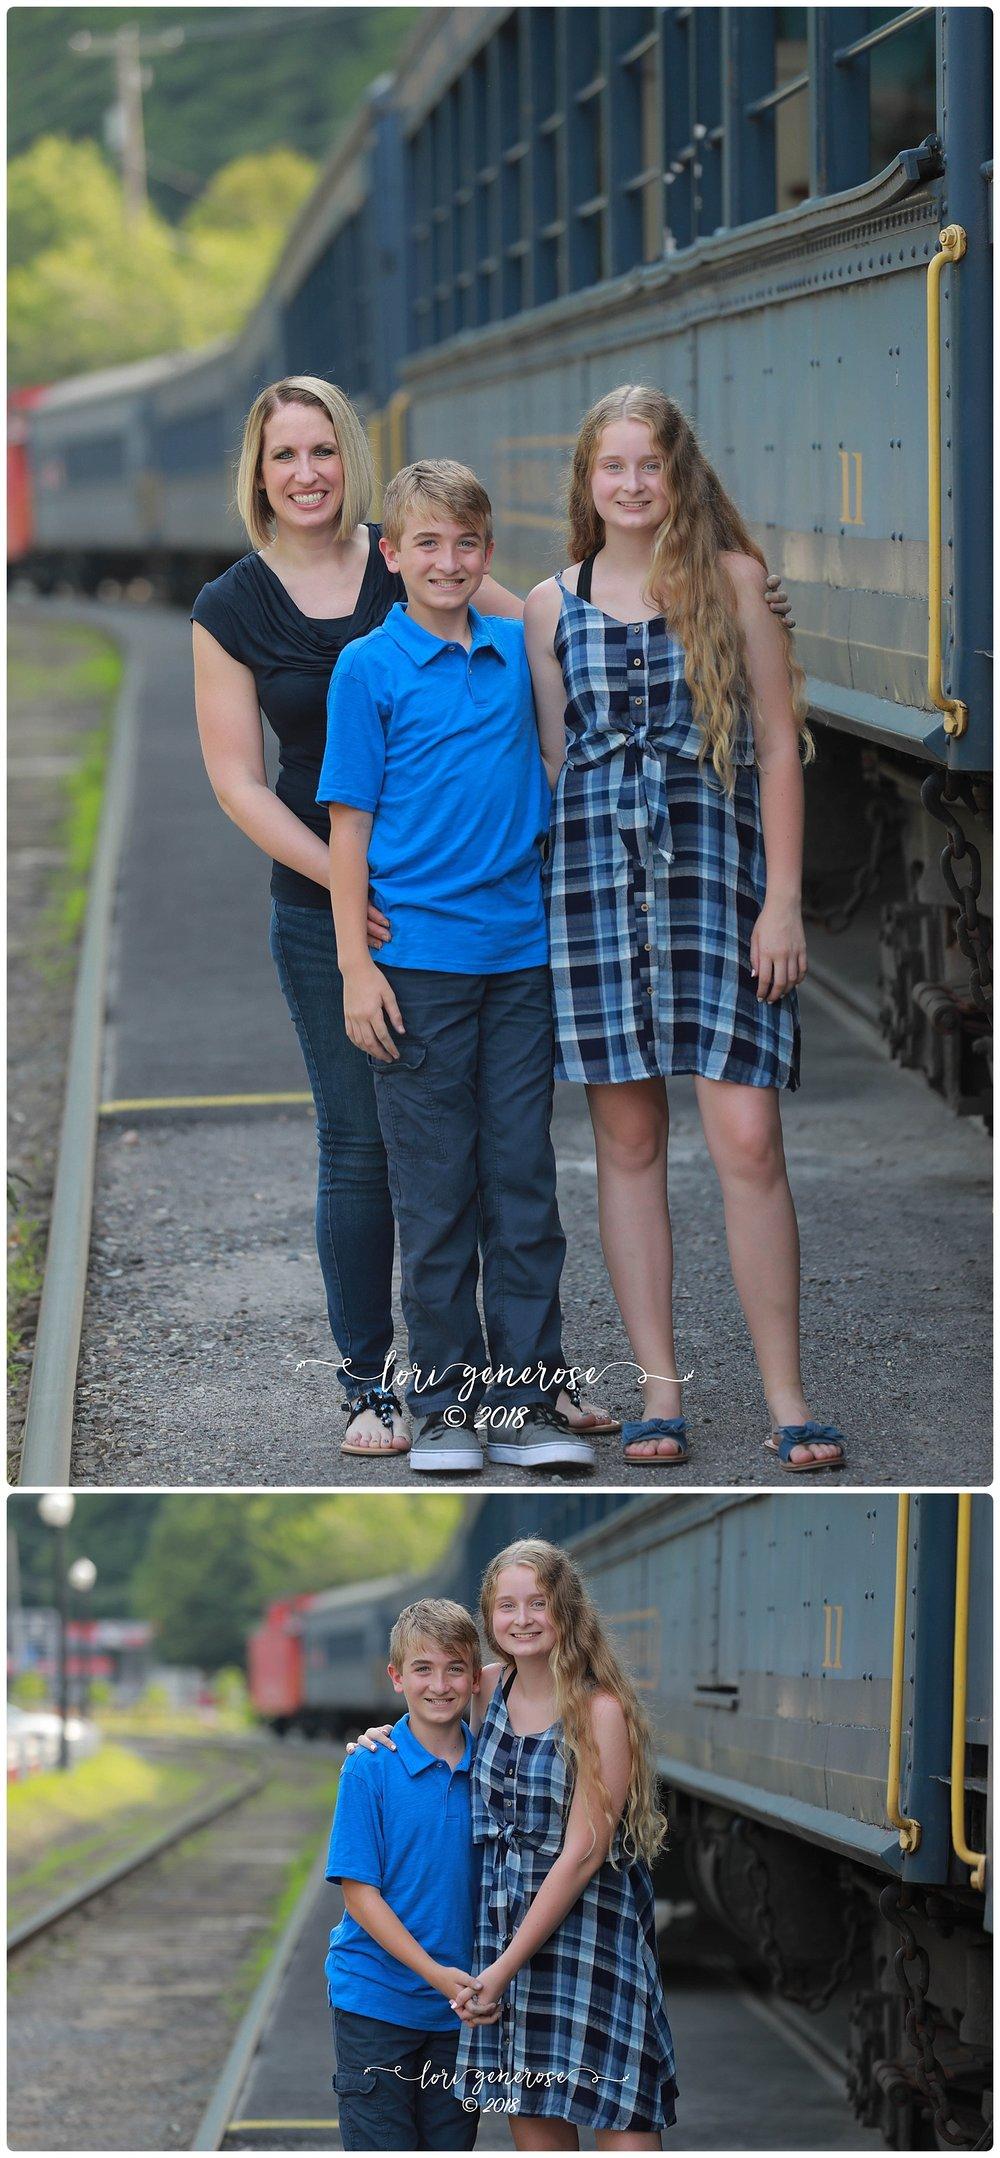 lgphotographylorigeneroseoutdooronlocationfamilysessionjimthorpepatrainstation.jpg